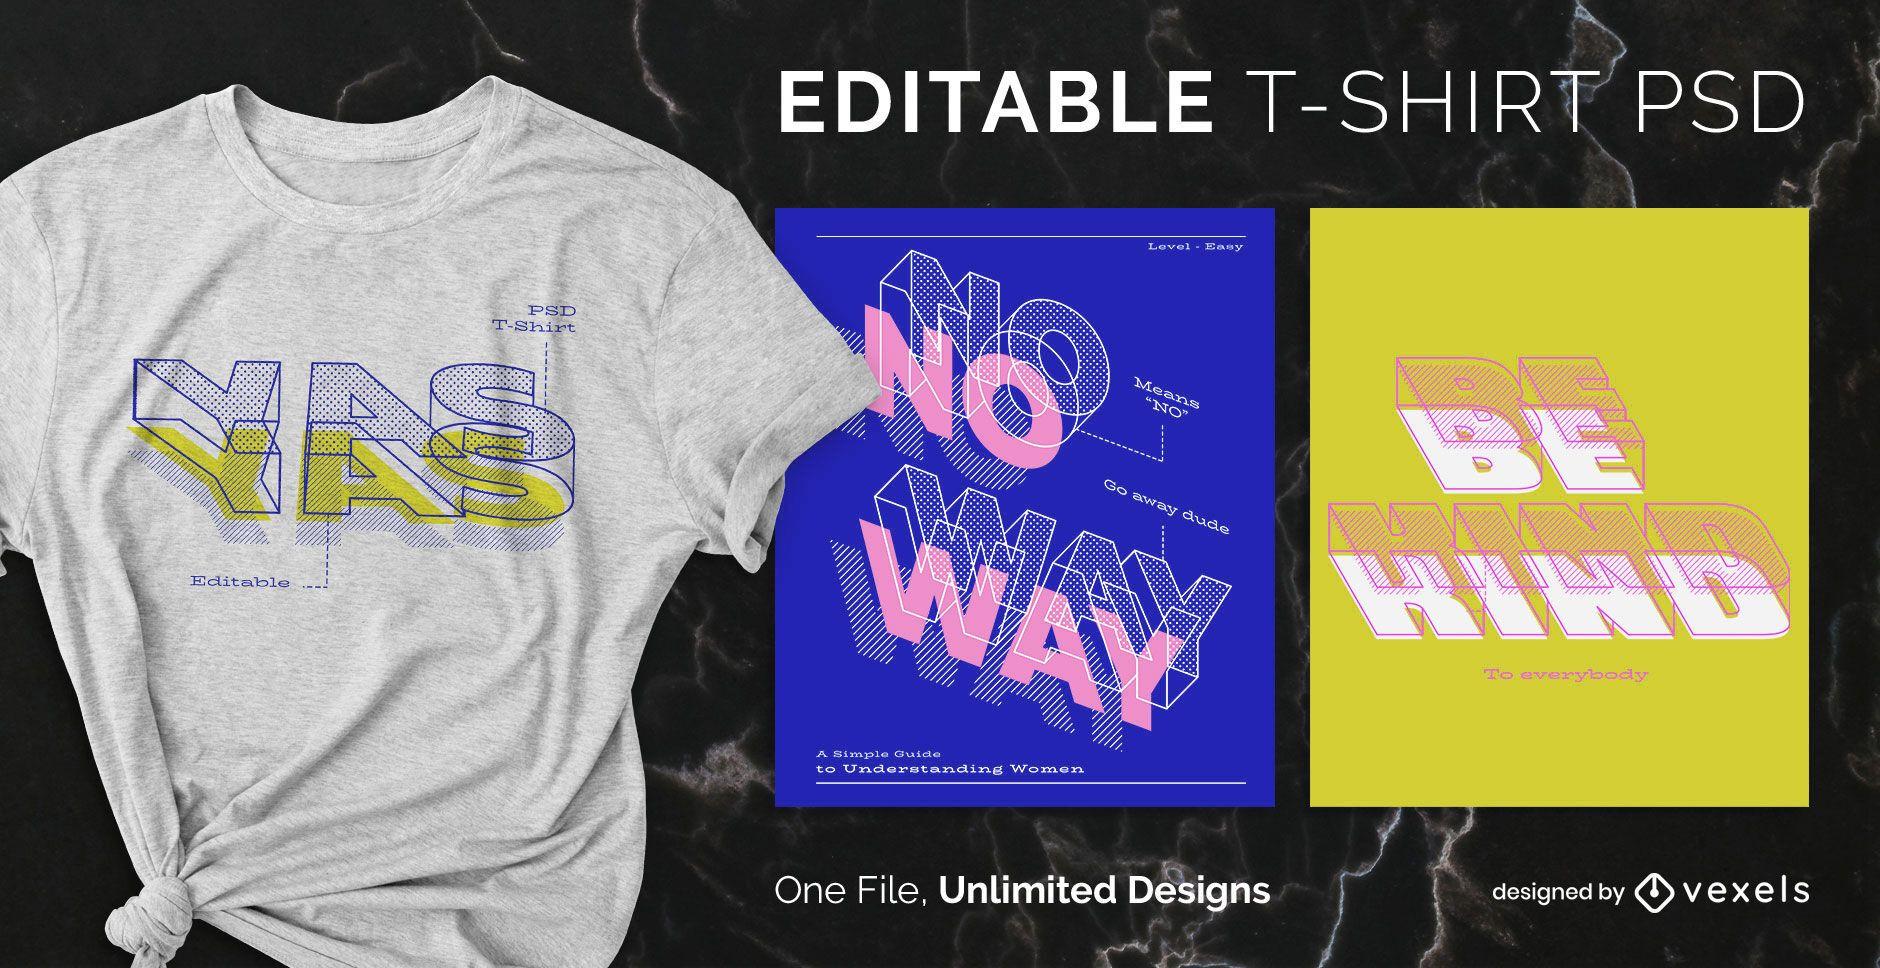 Blueprint text scalable t-shirt psd